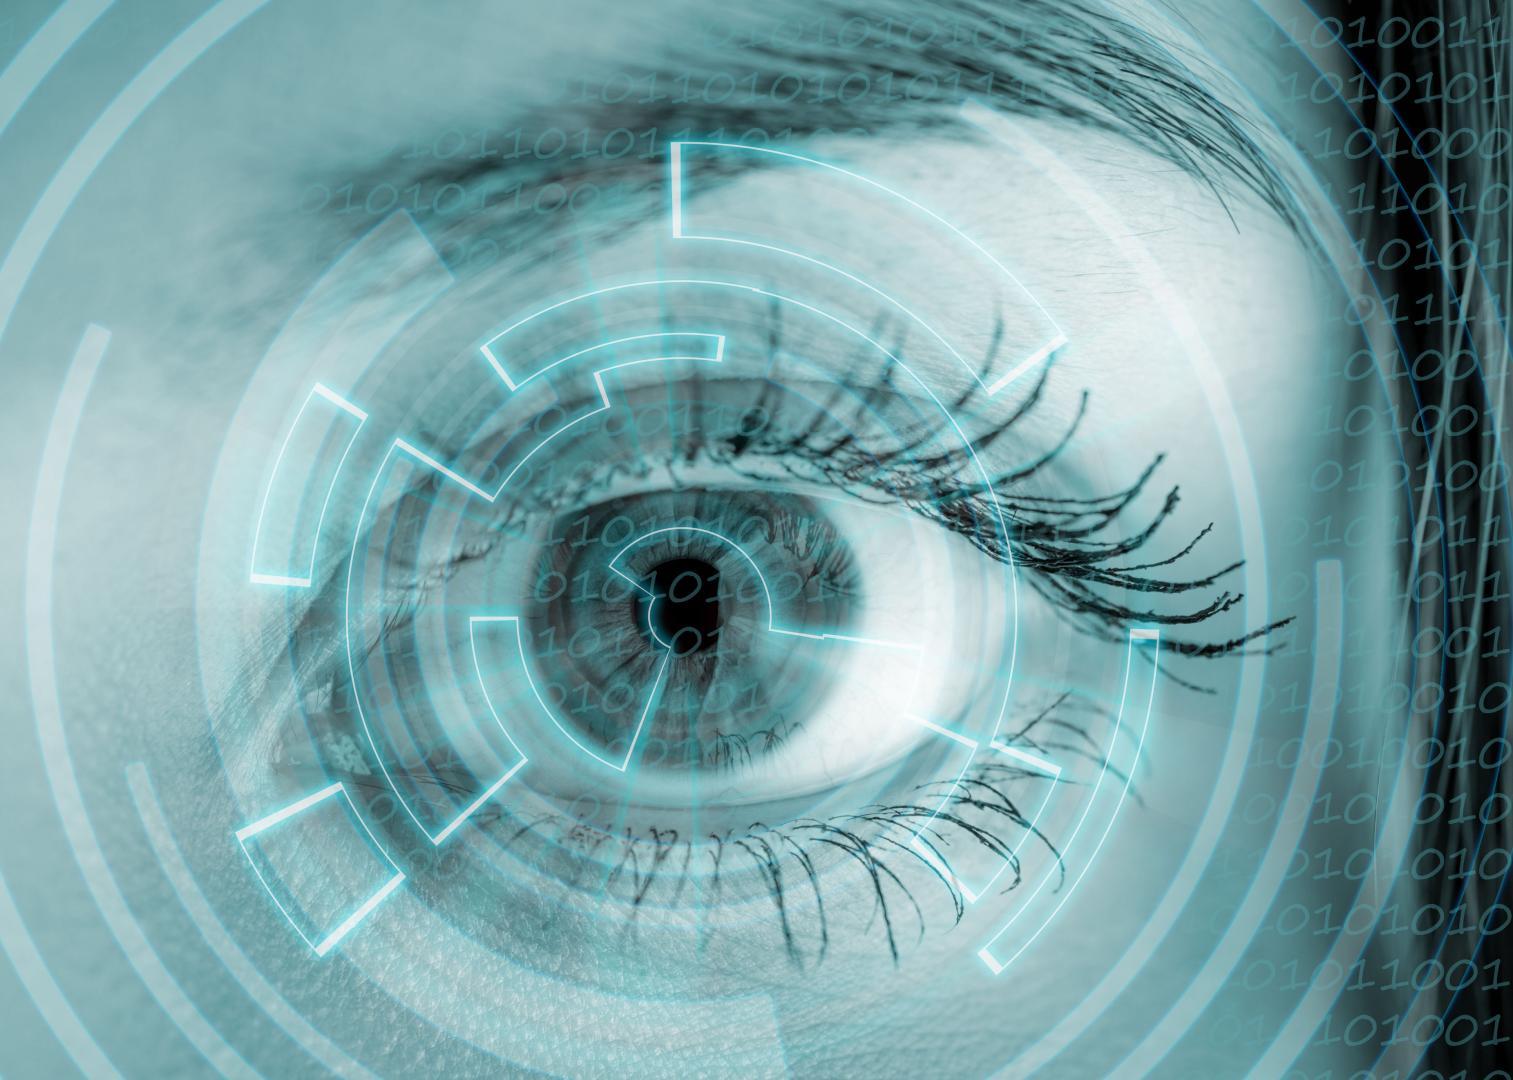 eyerobotica